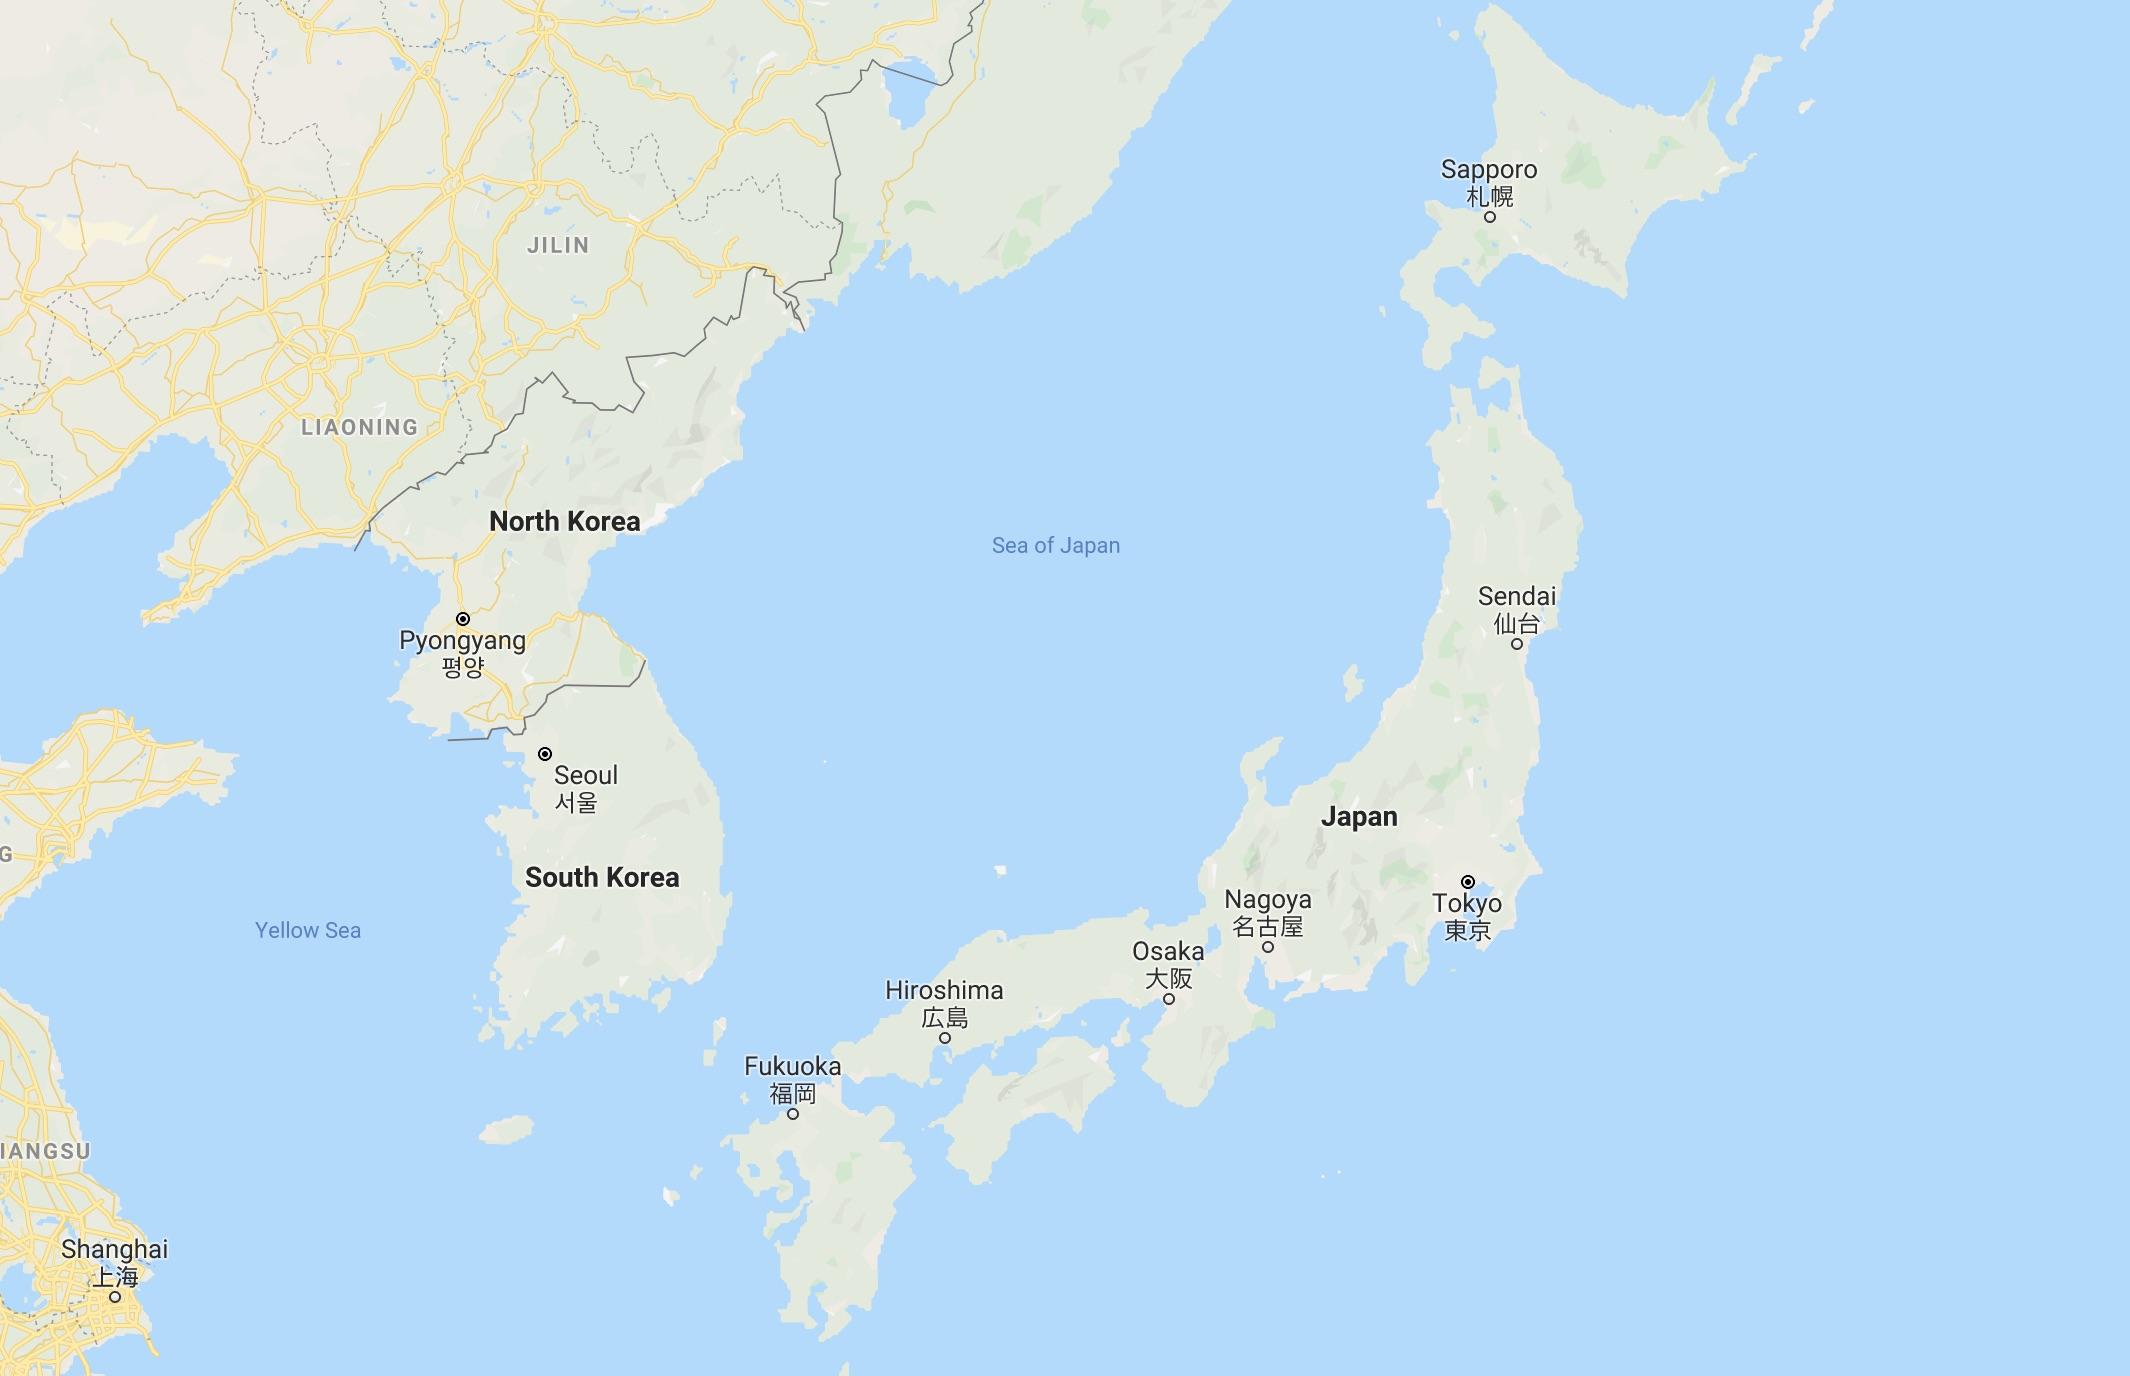 Screenshot of Japan from Google maps.